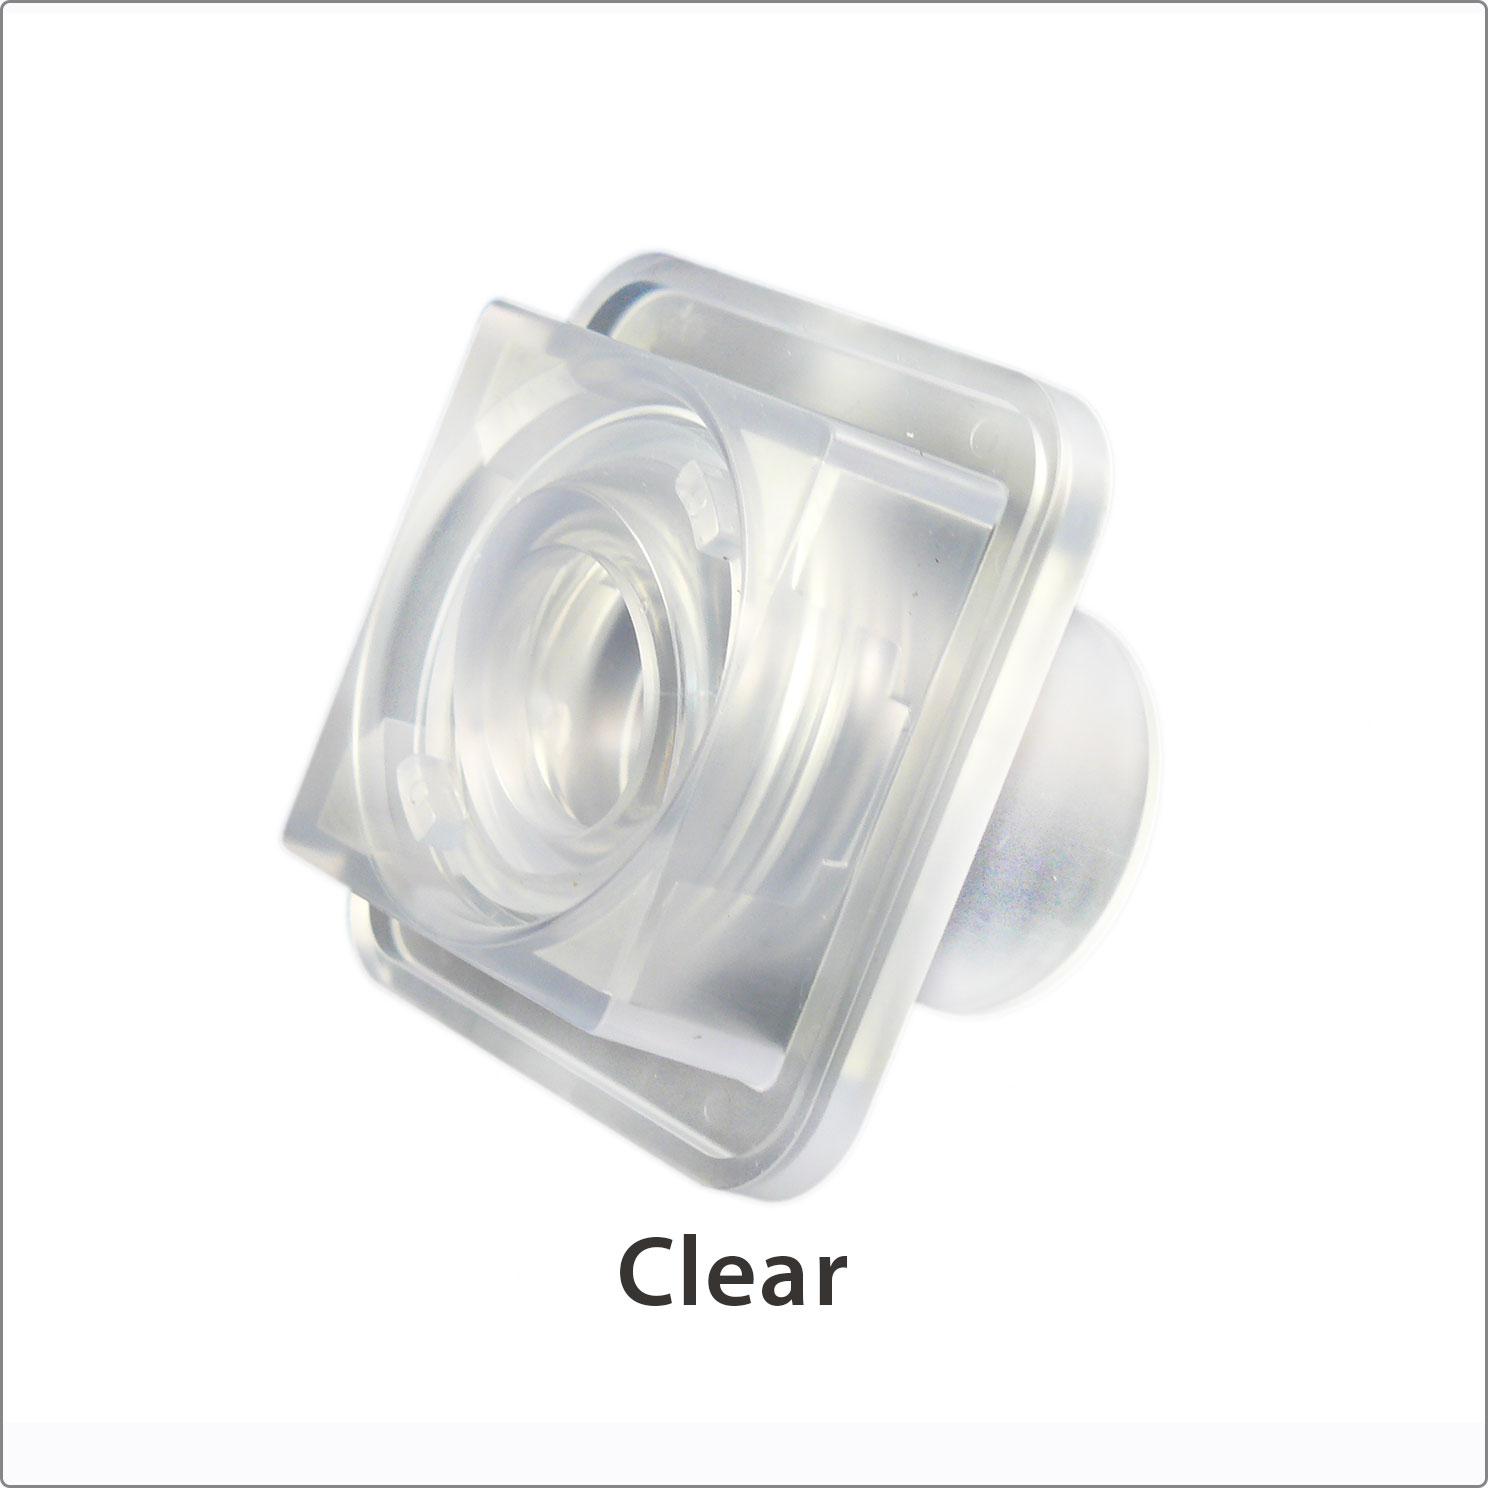 Square-Flush-Mount-Clear.jpg